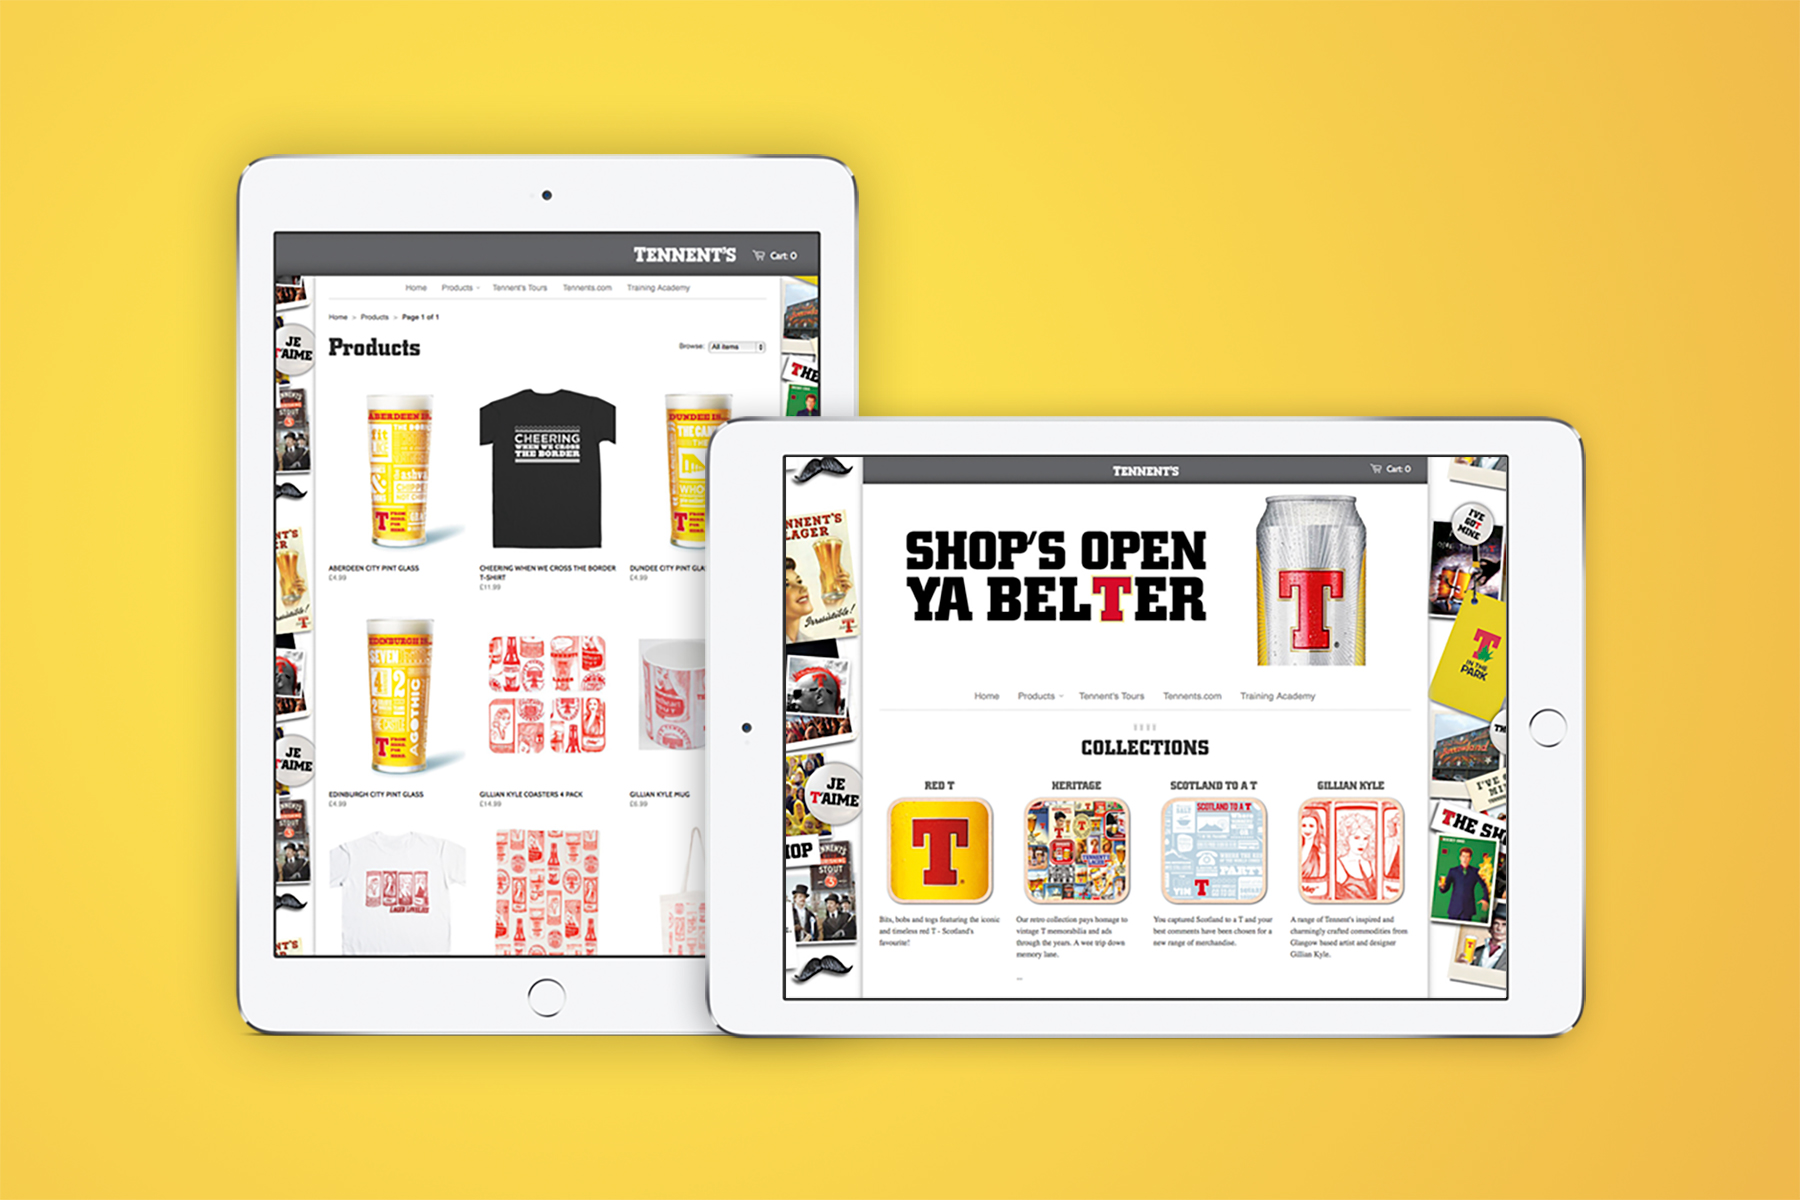 Tennents-Shop_iPad-Air_1800x1200-Large